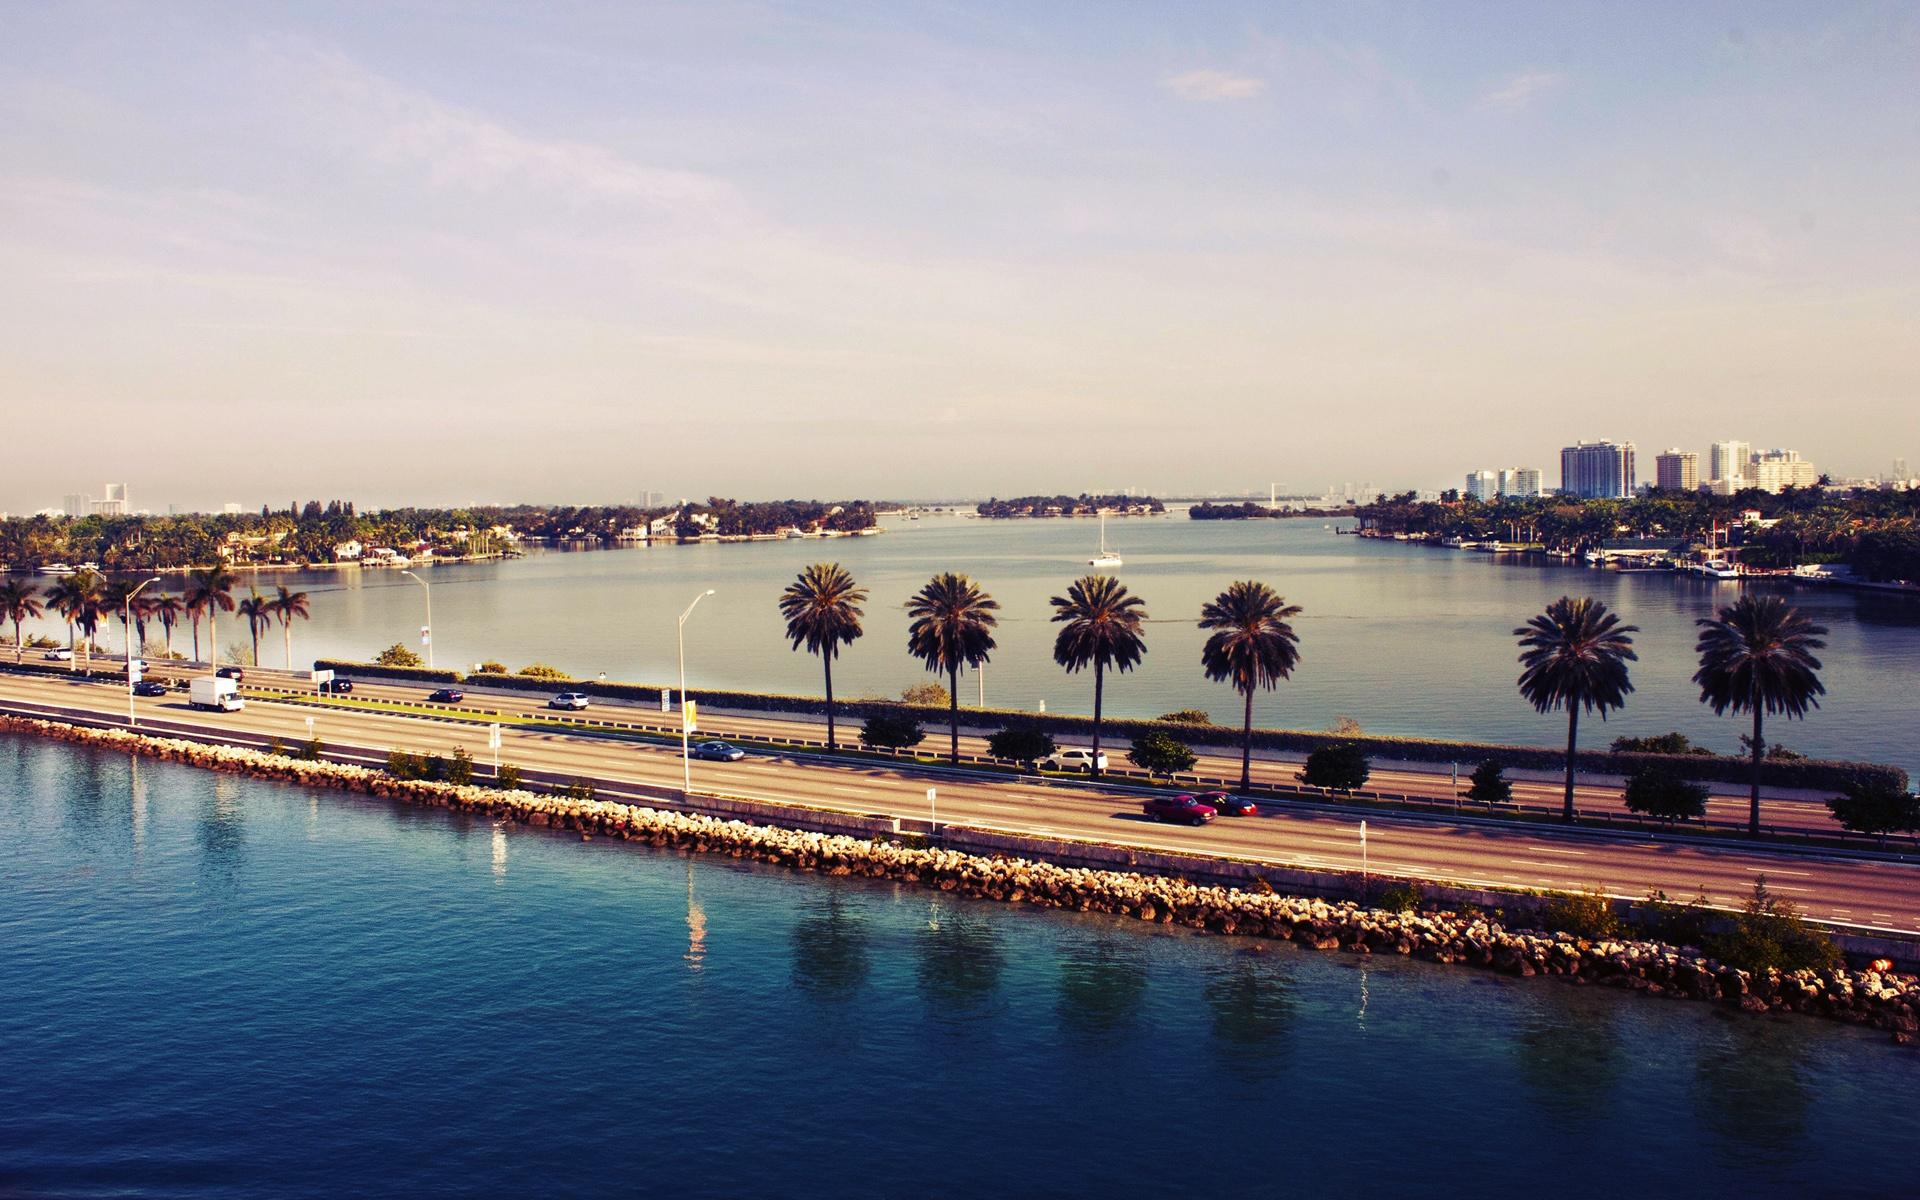 Wallpaper Miami, Florida, Usa, Sunset, Water, Road, - Gta Vice City Wallpaper 4k , HD Wallpaper & Backgrounds